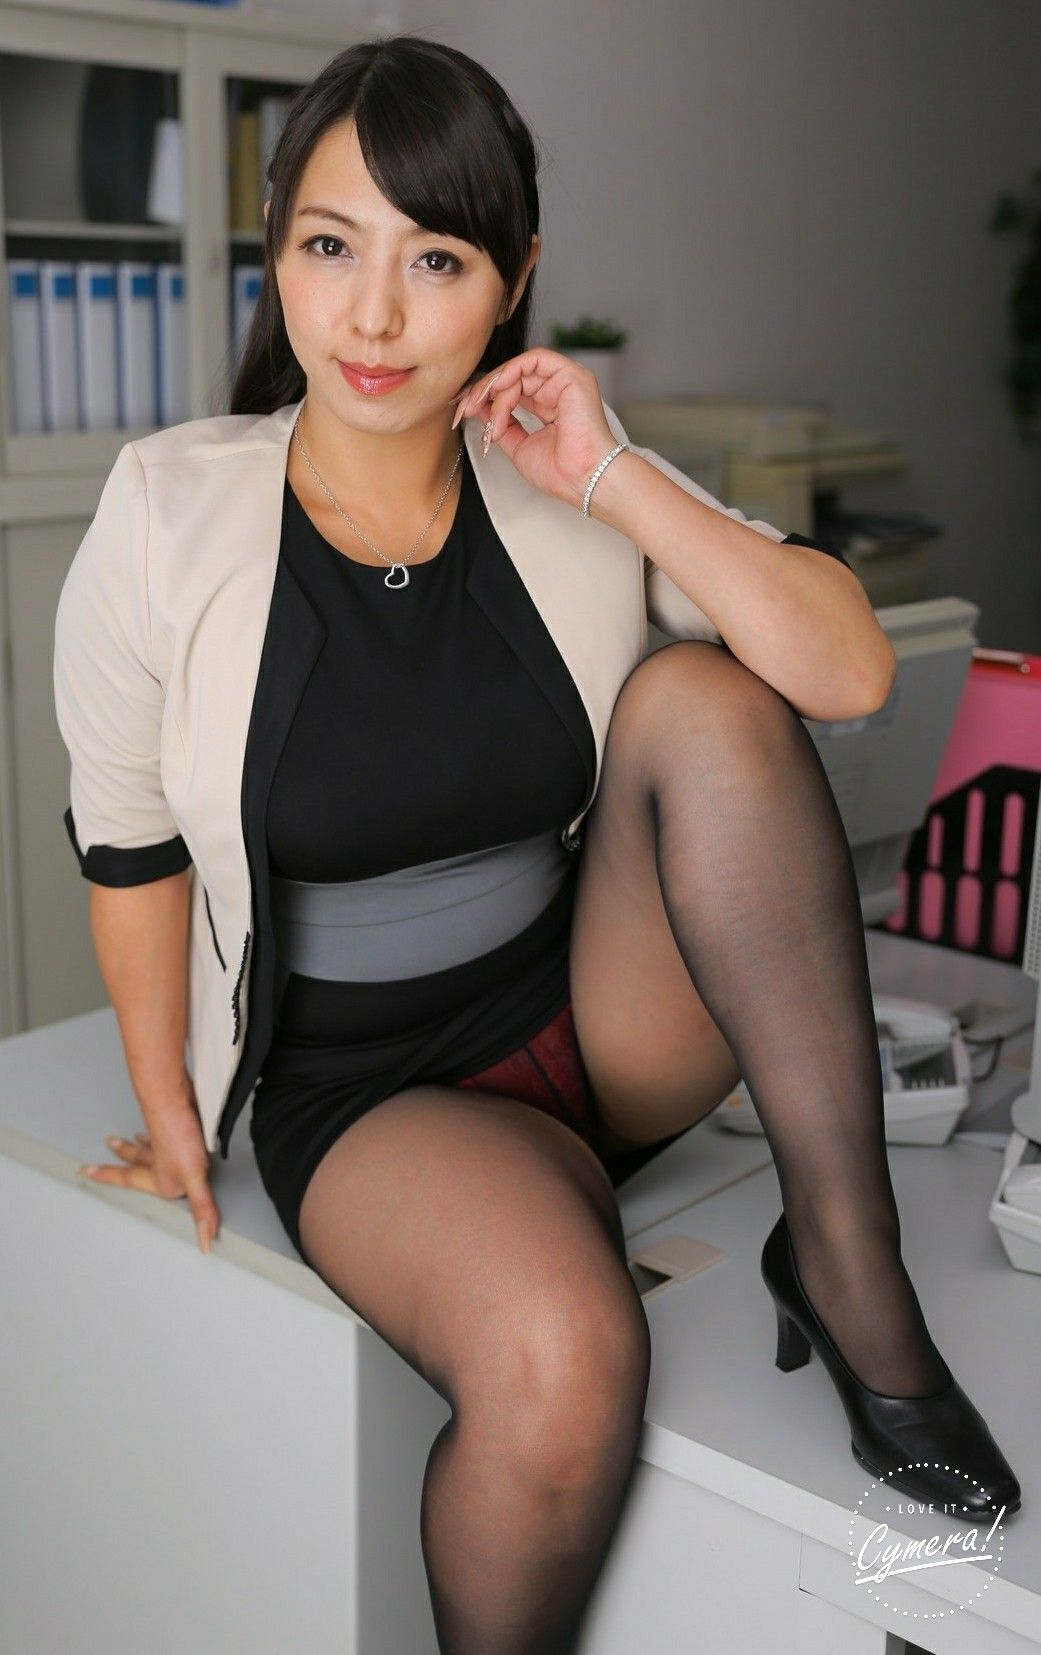 Secretary Asian Woman Asian Girl Office Ladies Japanese Sexy Ladies Model